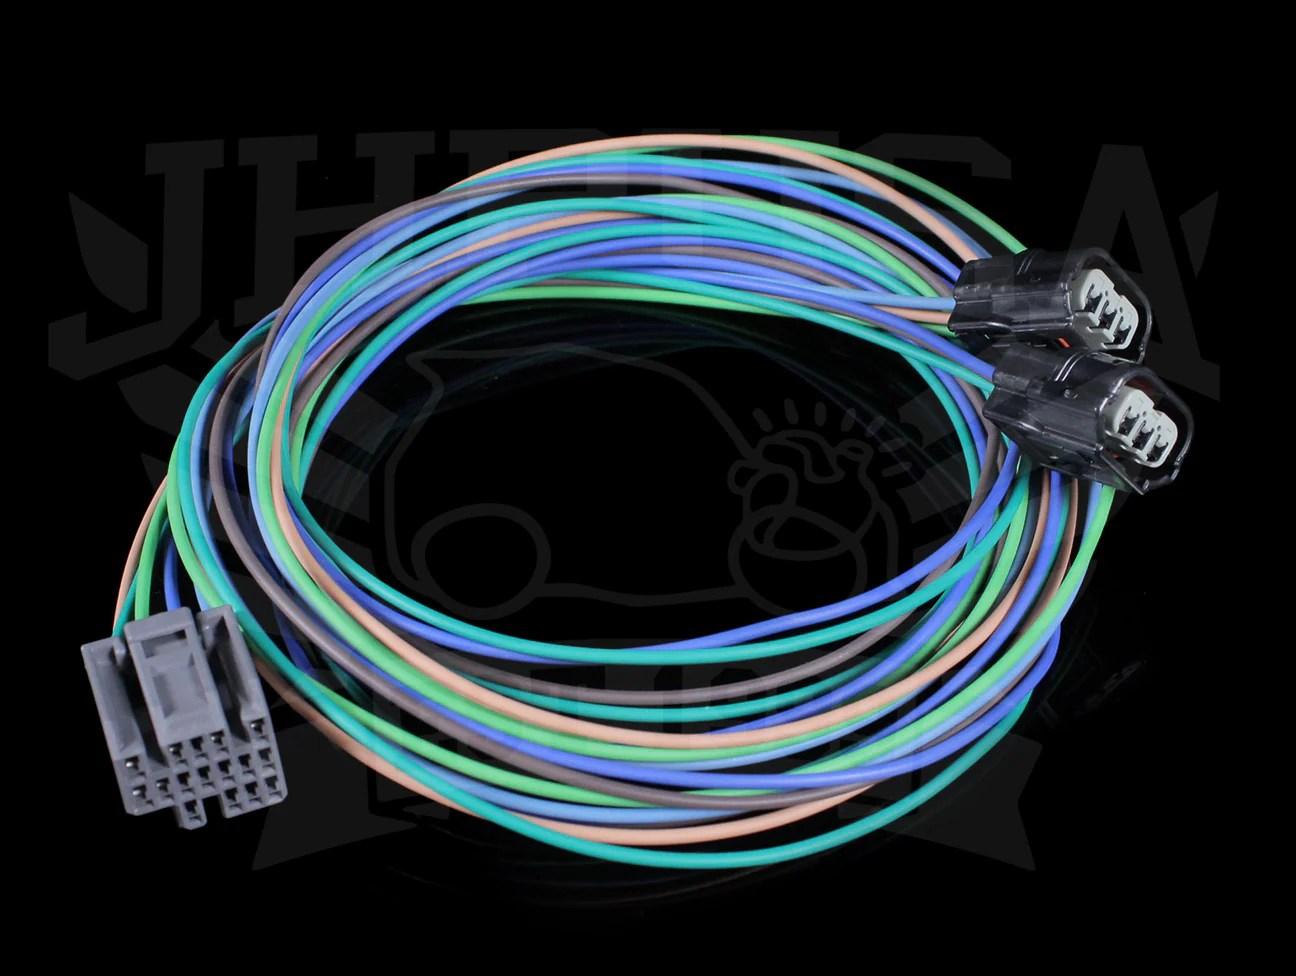 s2000 k pro wiring harness install wiring diagram used s2000 k pro wiring harness [ 1296 x 976 Pixel ]